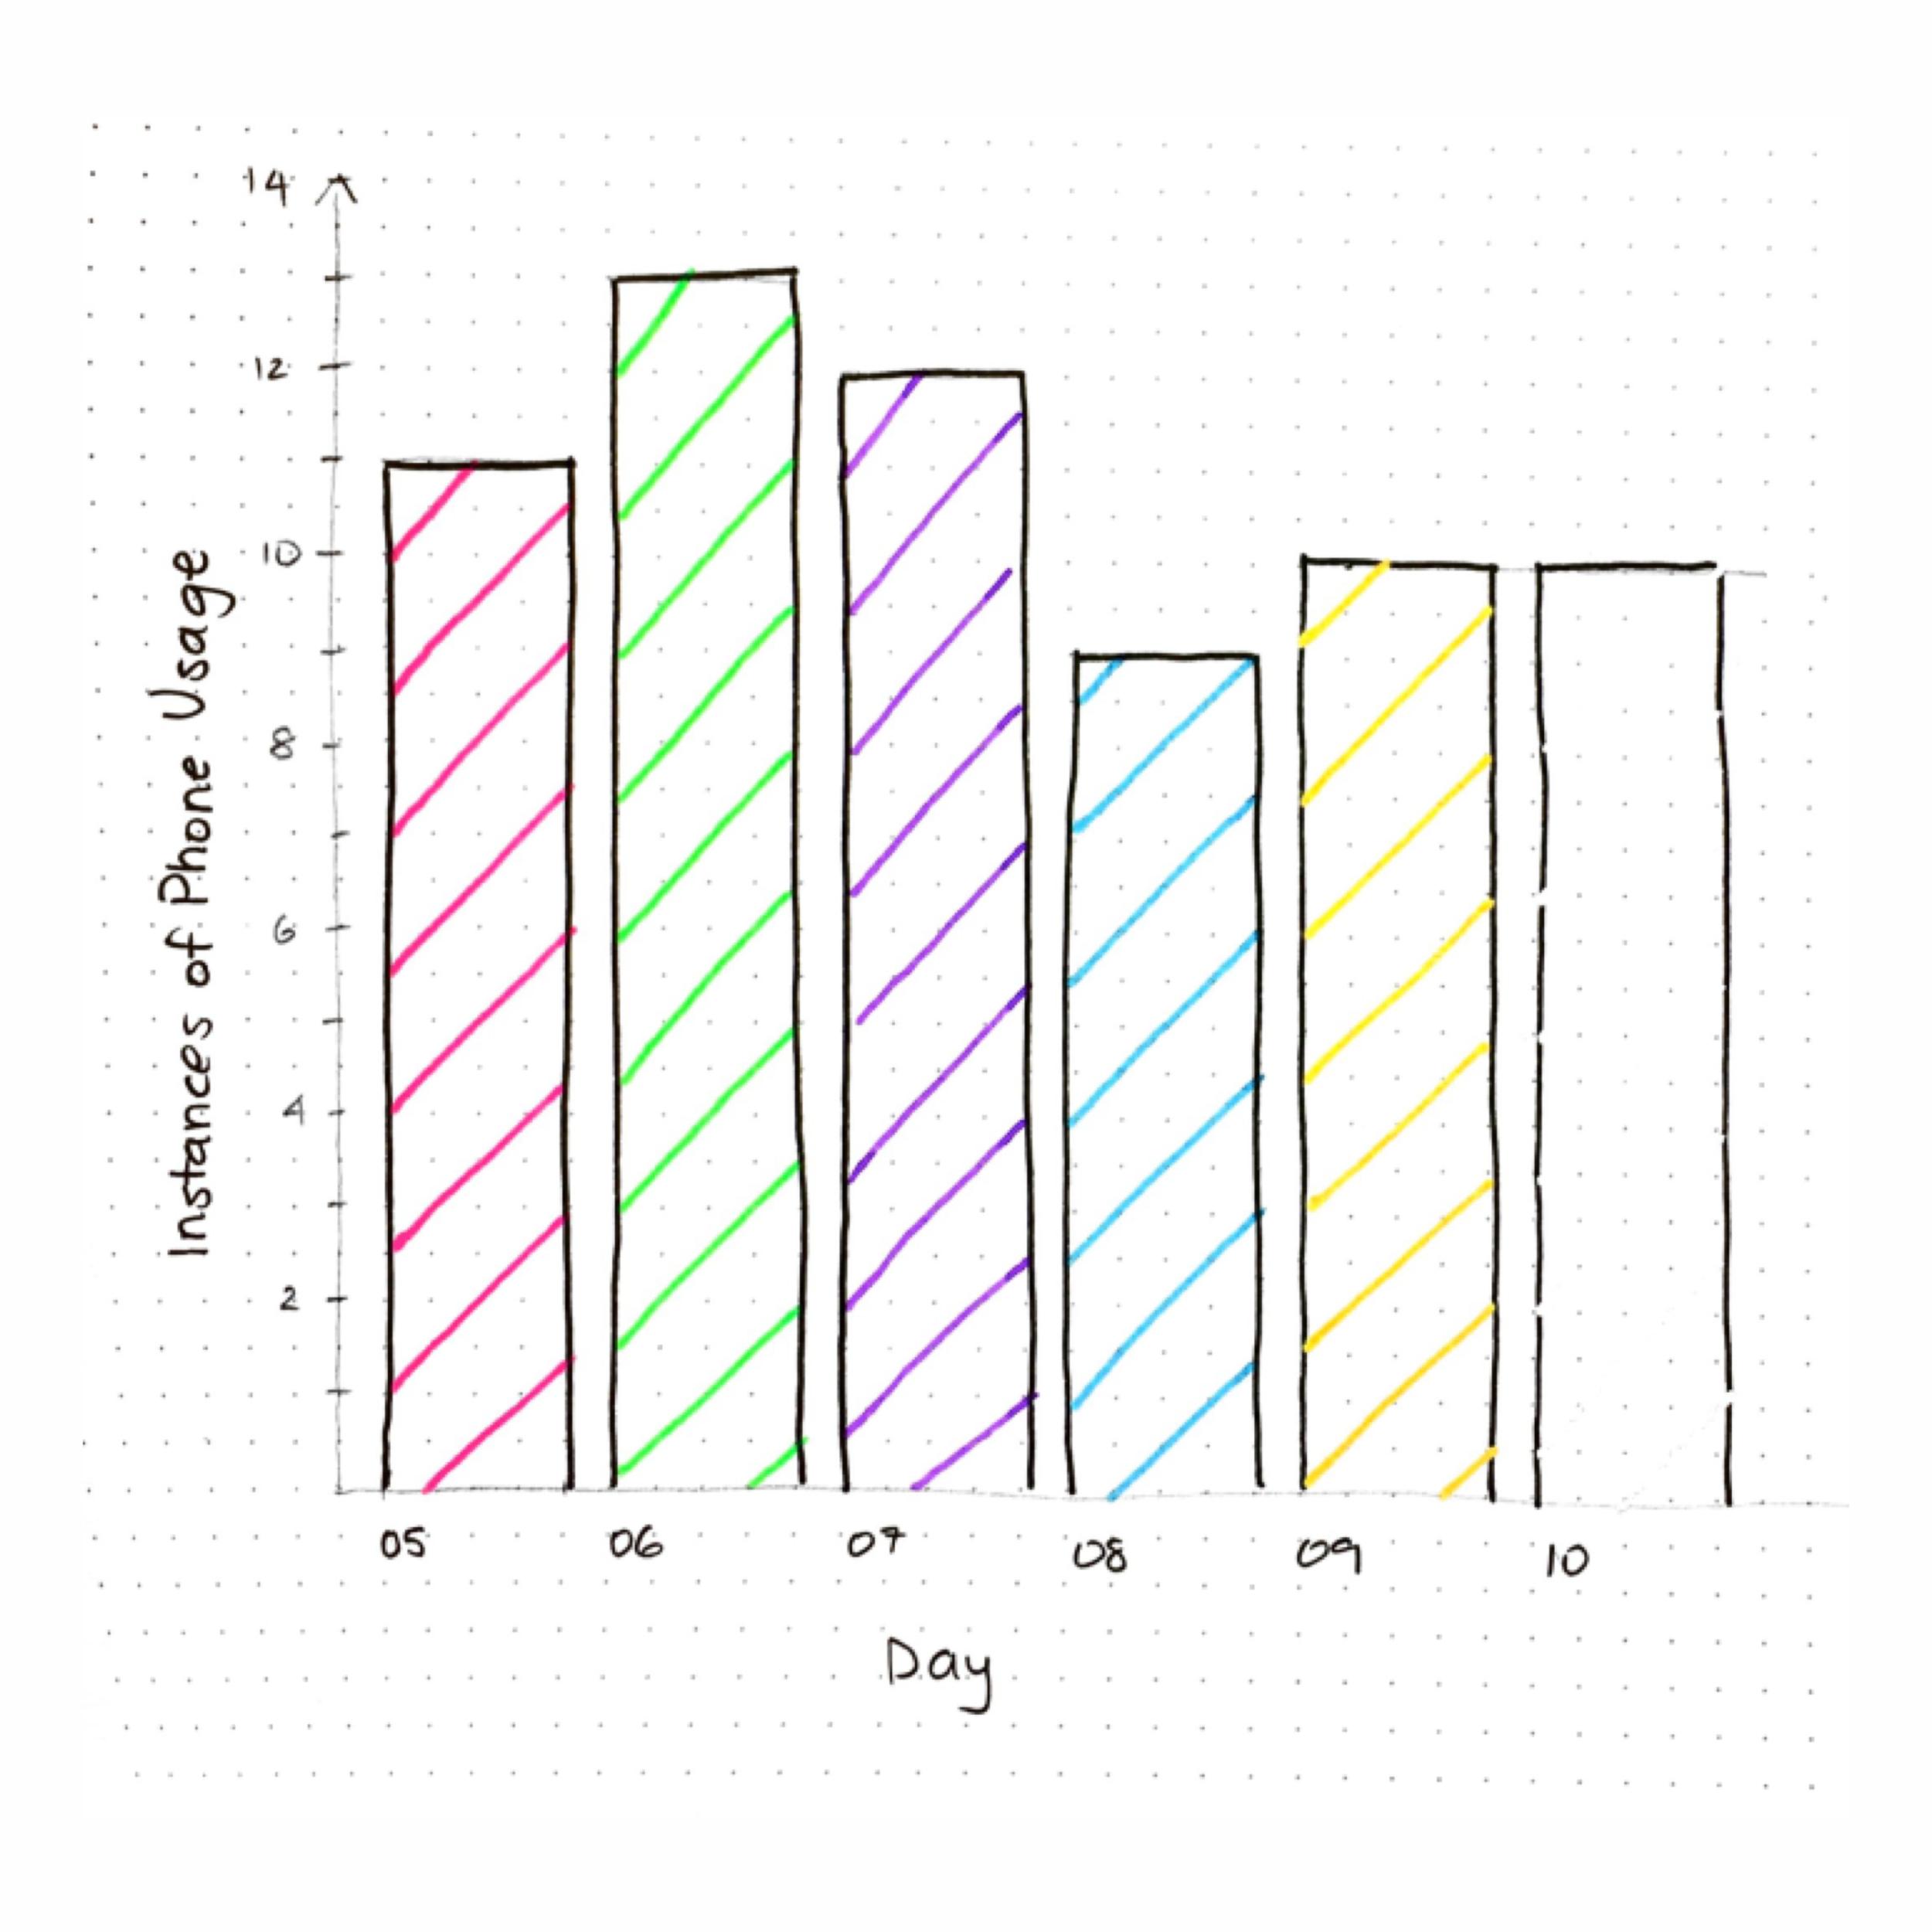 spotify_datavis-sketch-4.png